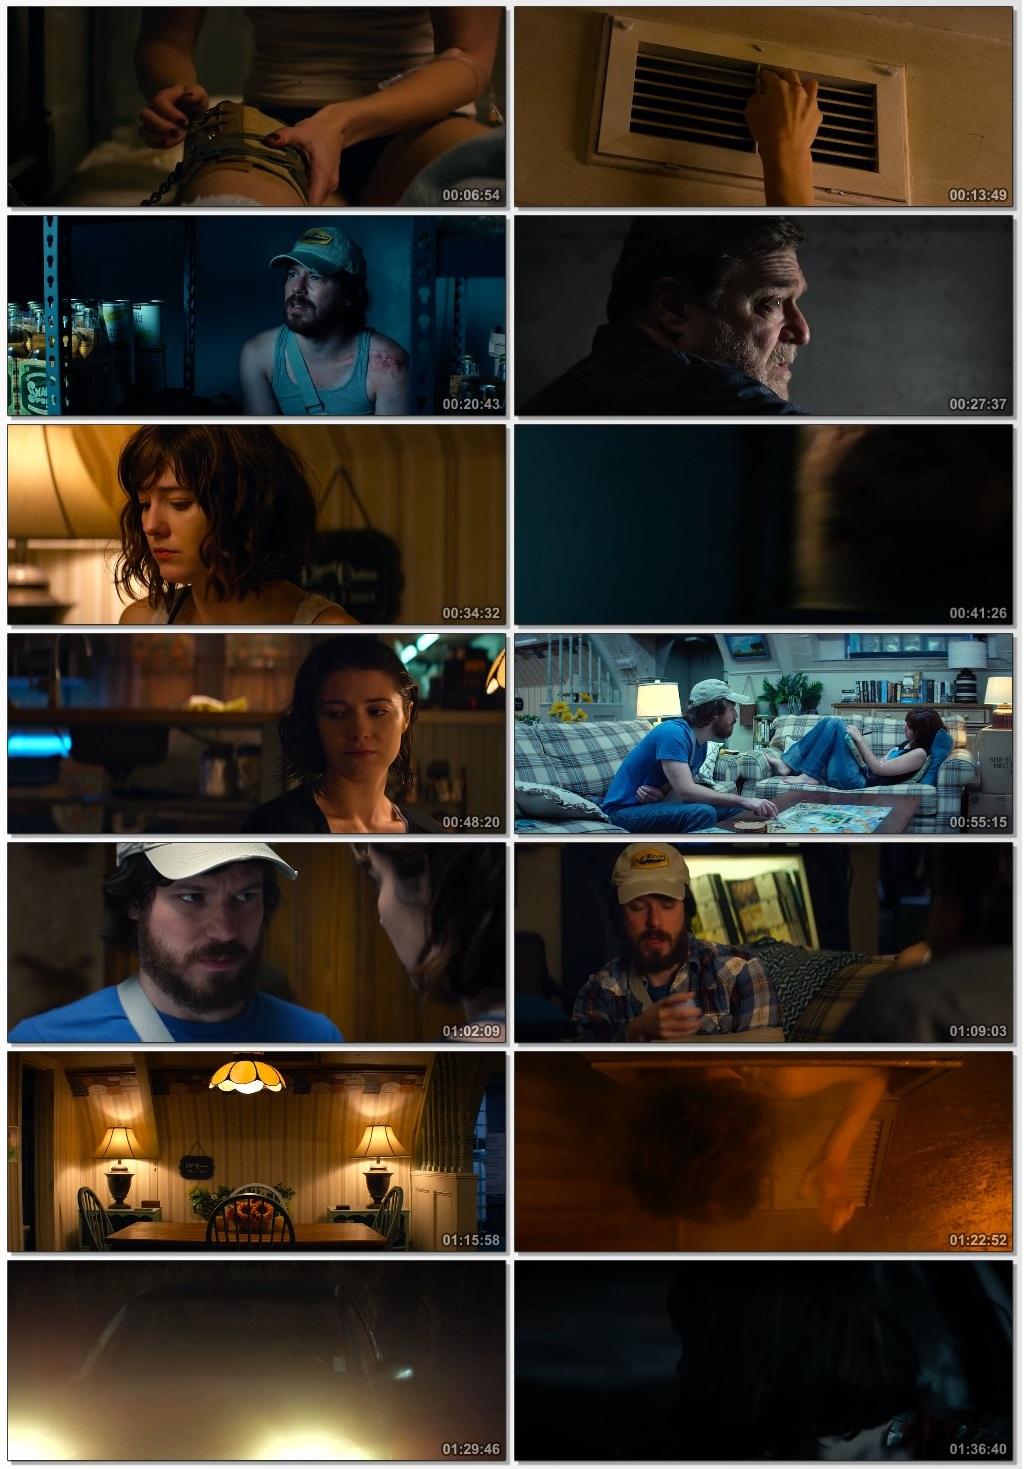 cloverfield lane full movie in hindi